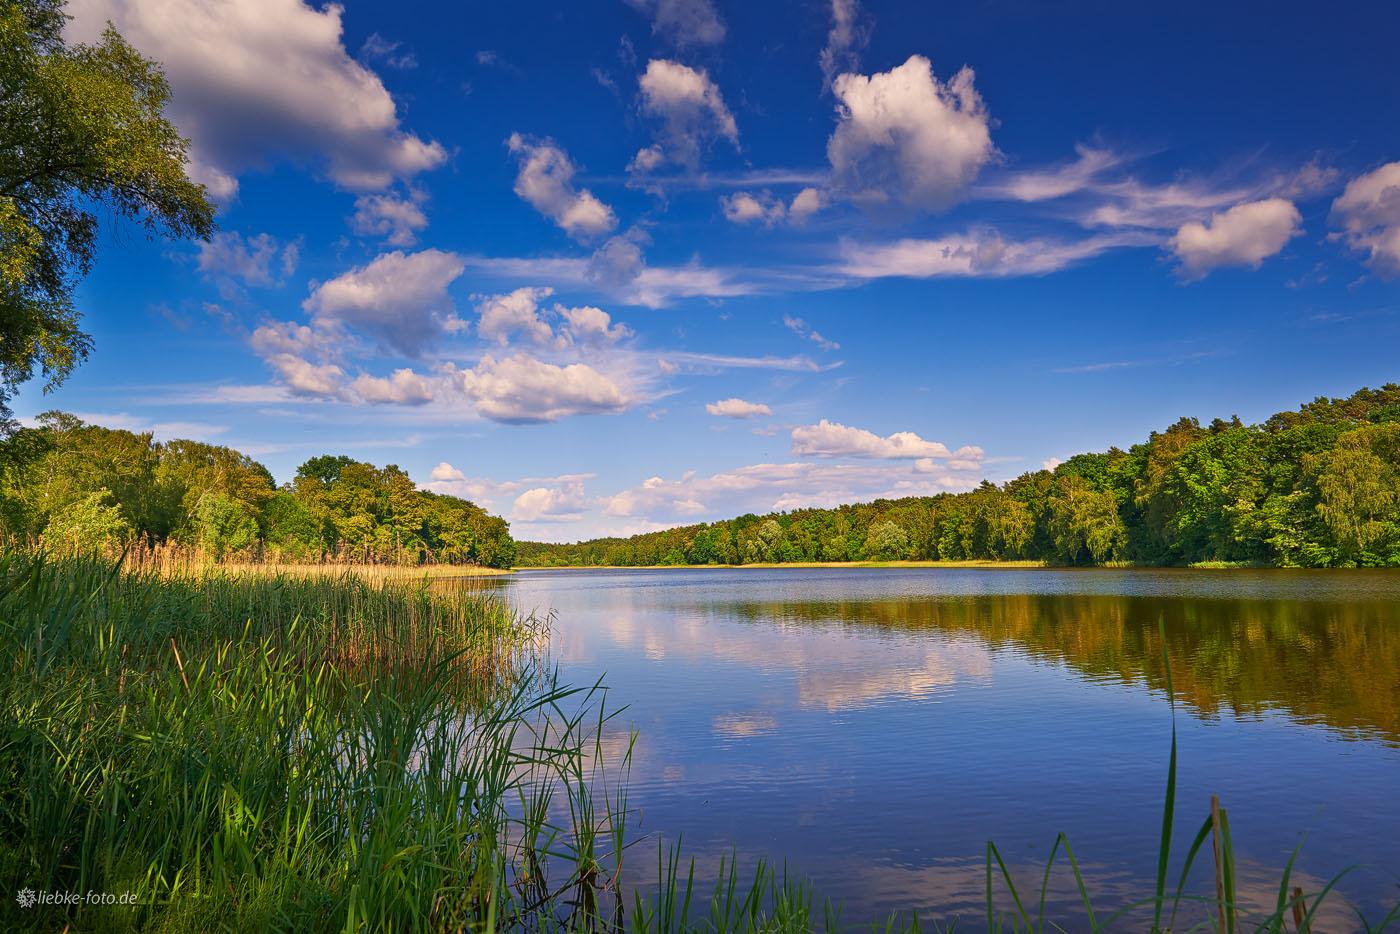 Sommerfrische am Beetzer See, Oberhavel